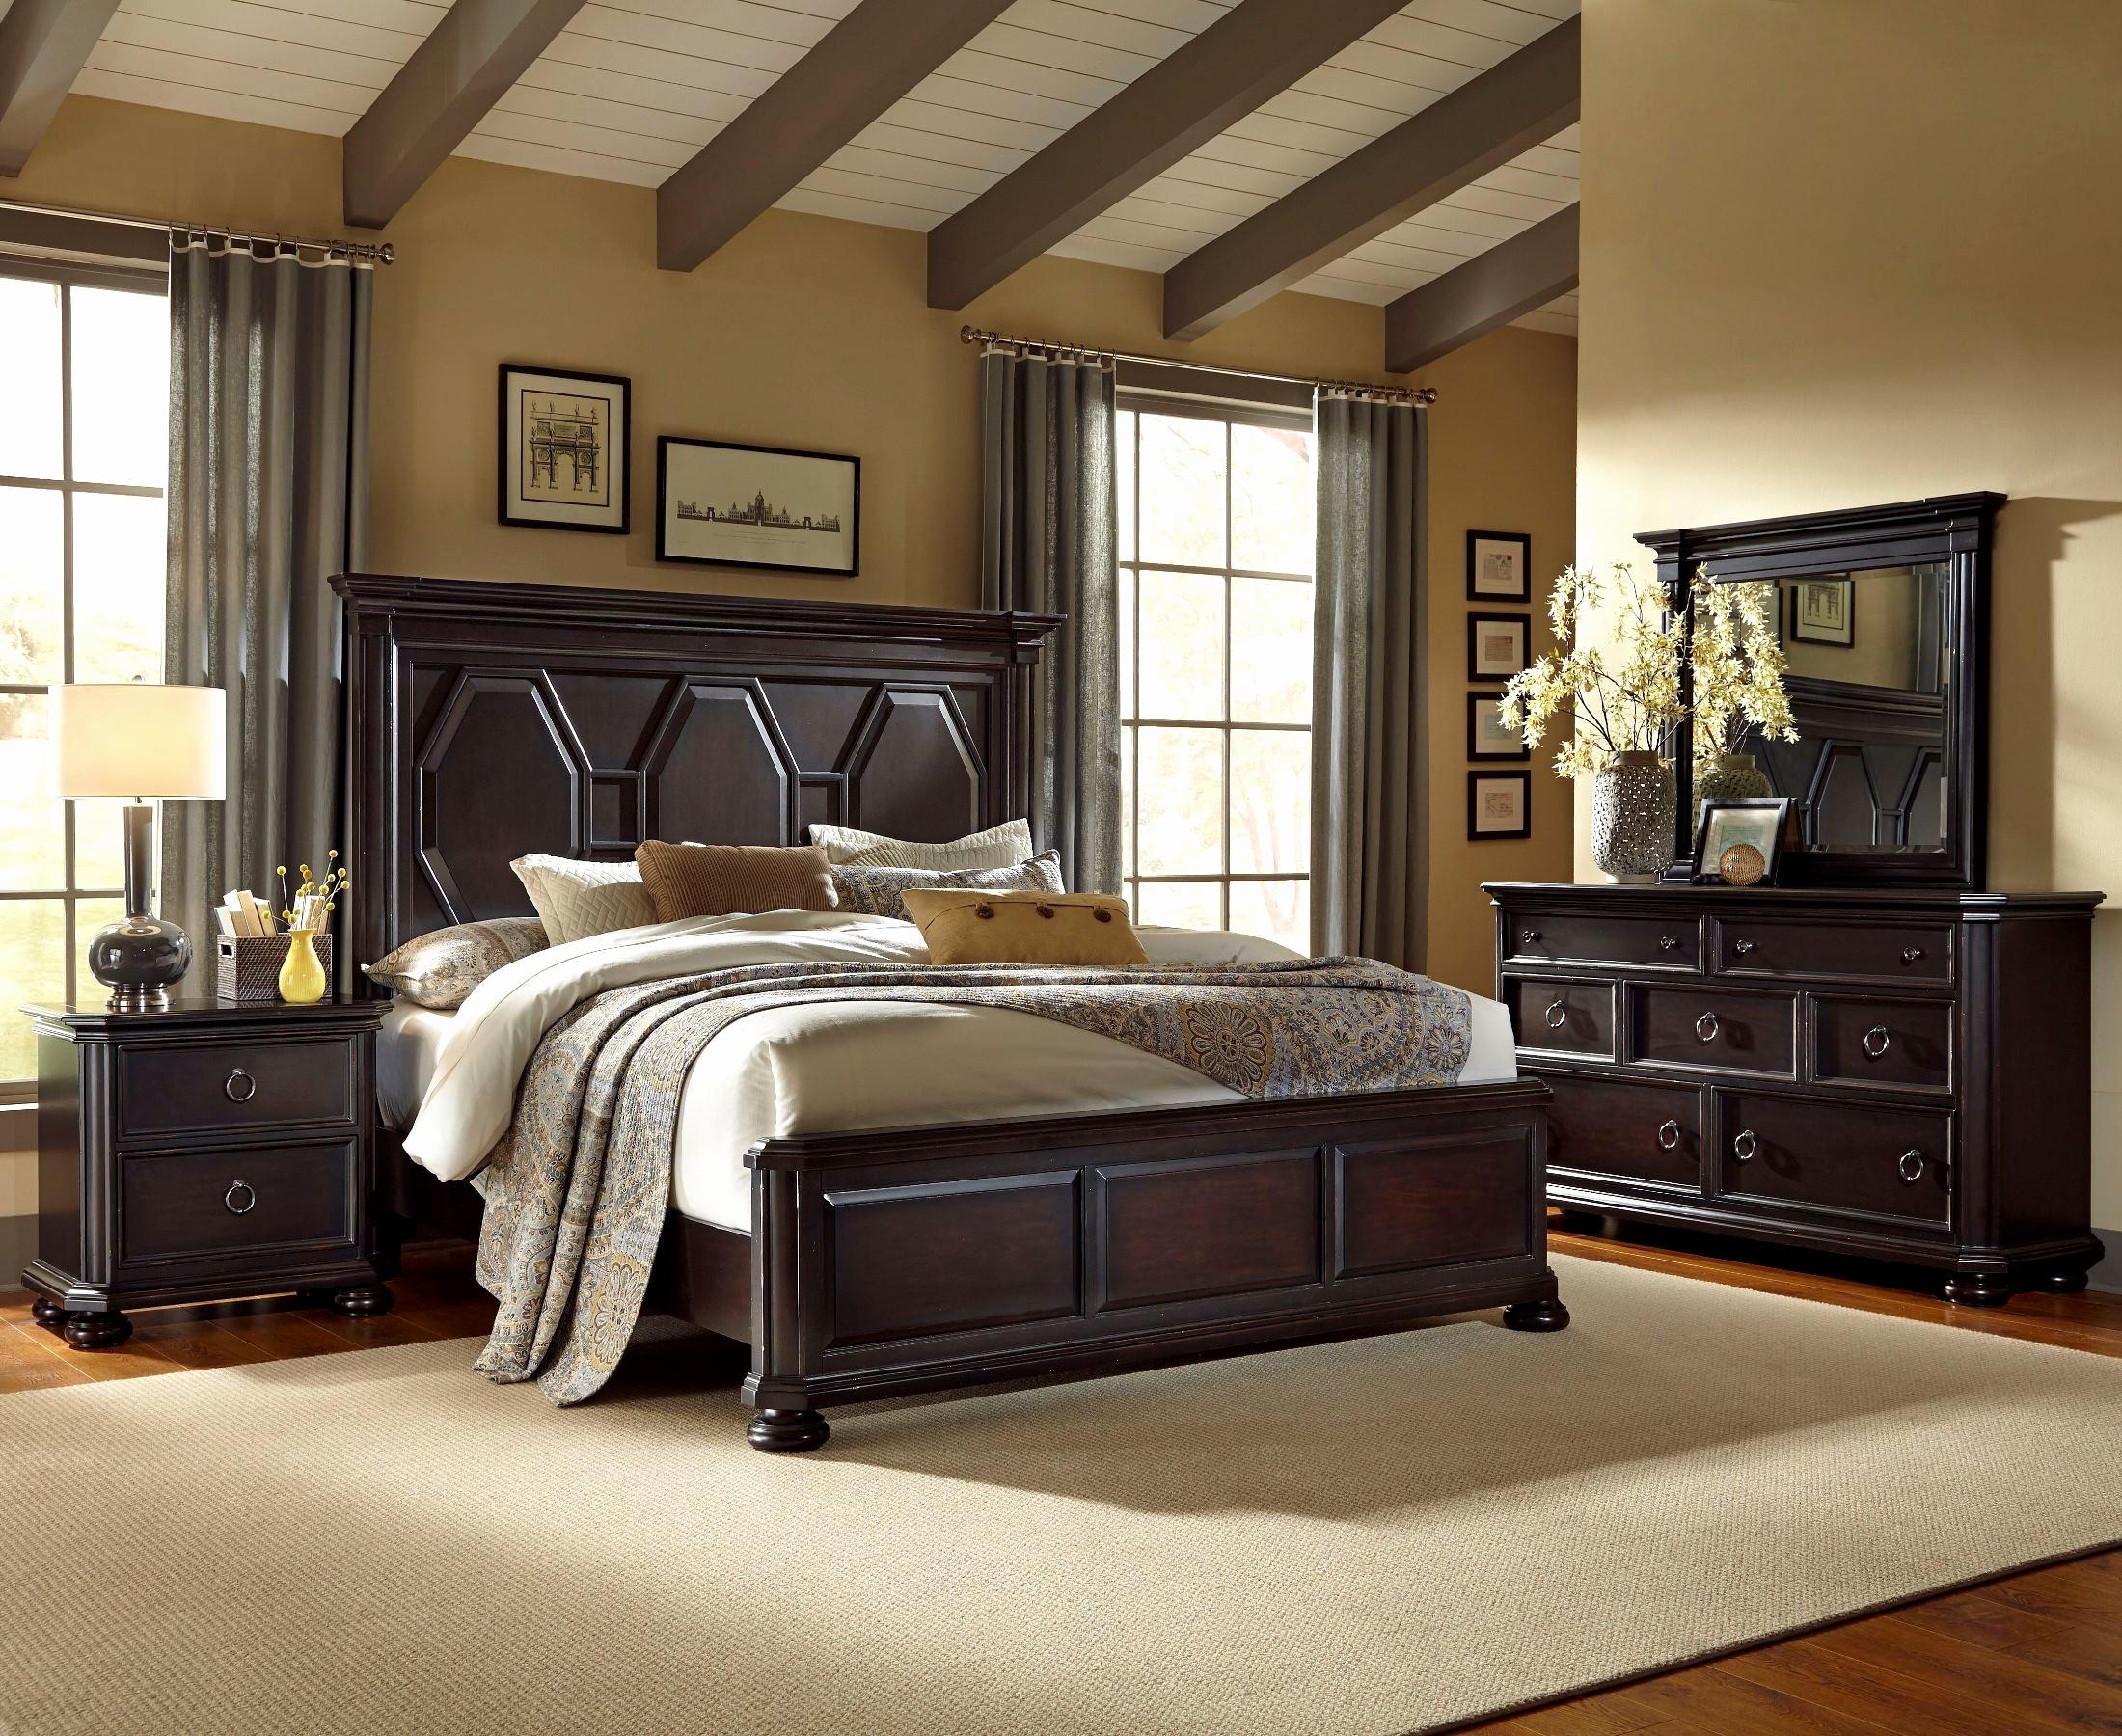 exotic bedroom furniture sets photo - 9